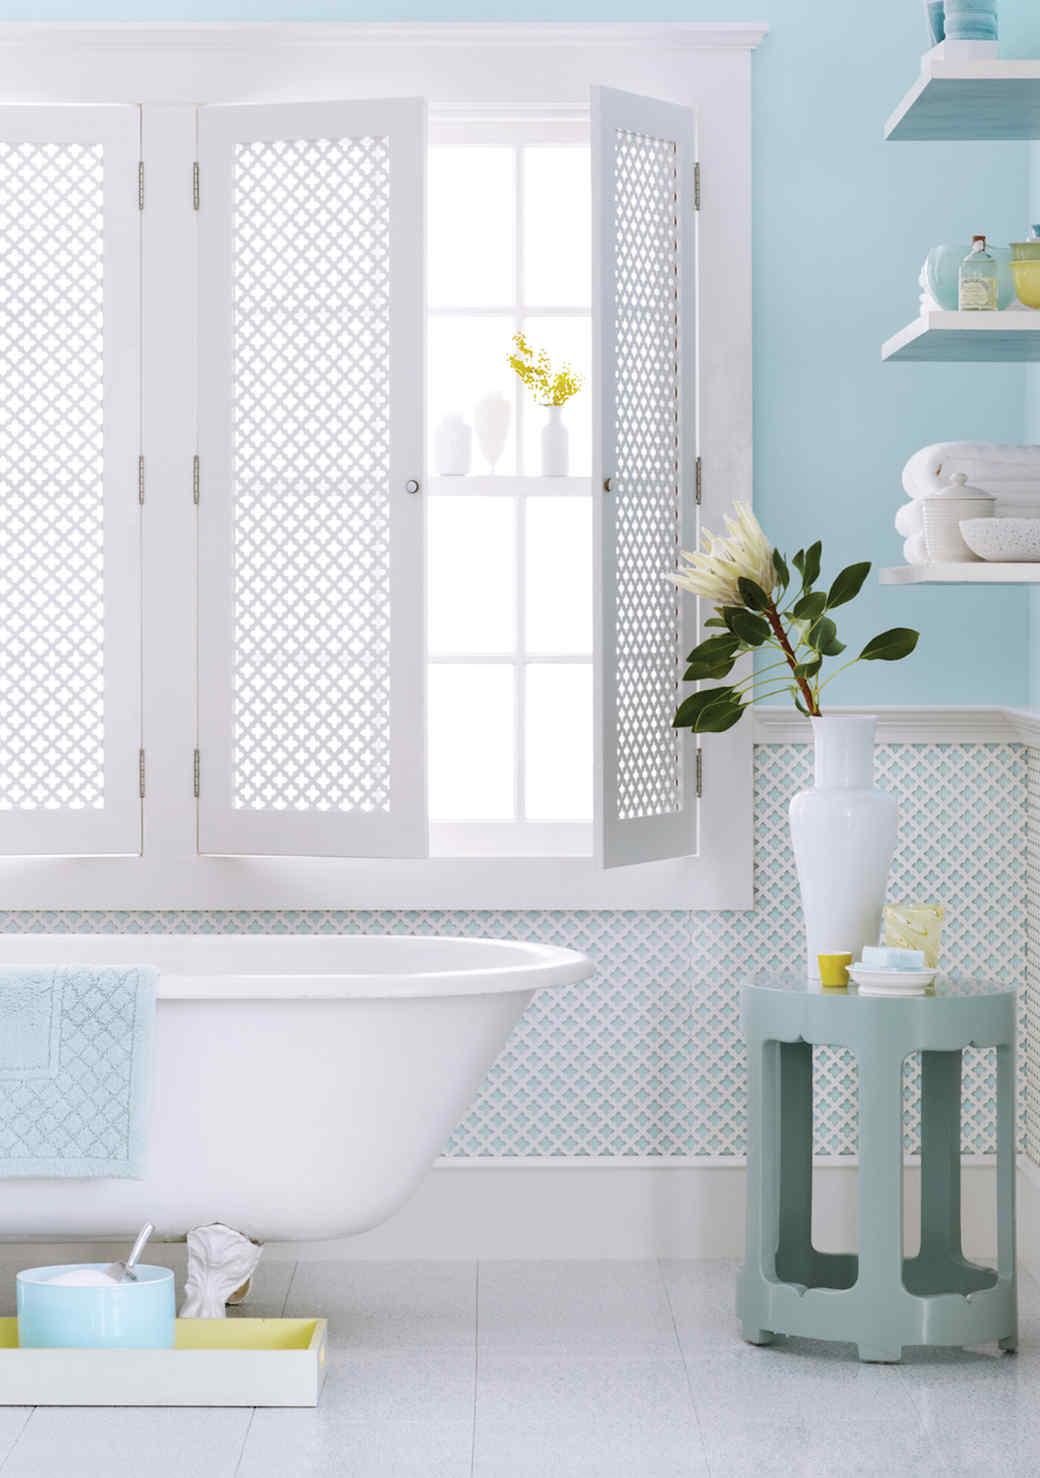 blue-white-bathroom-1016.jpg (skyword:349547)